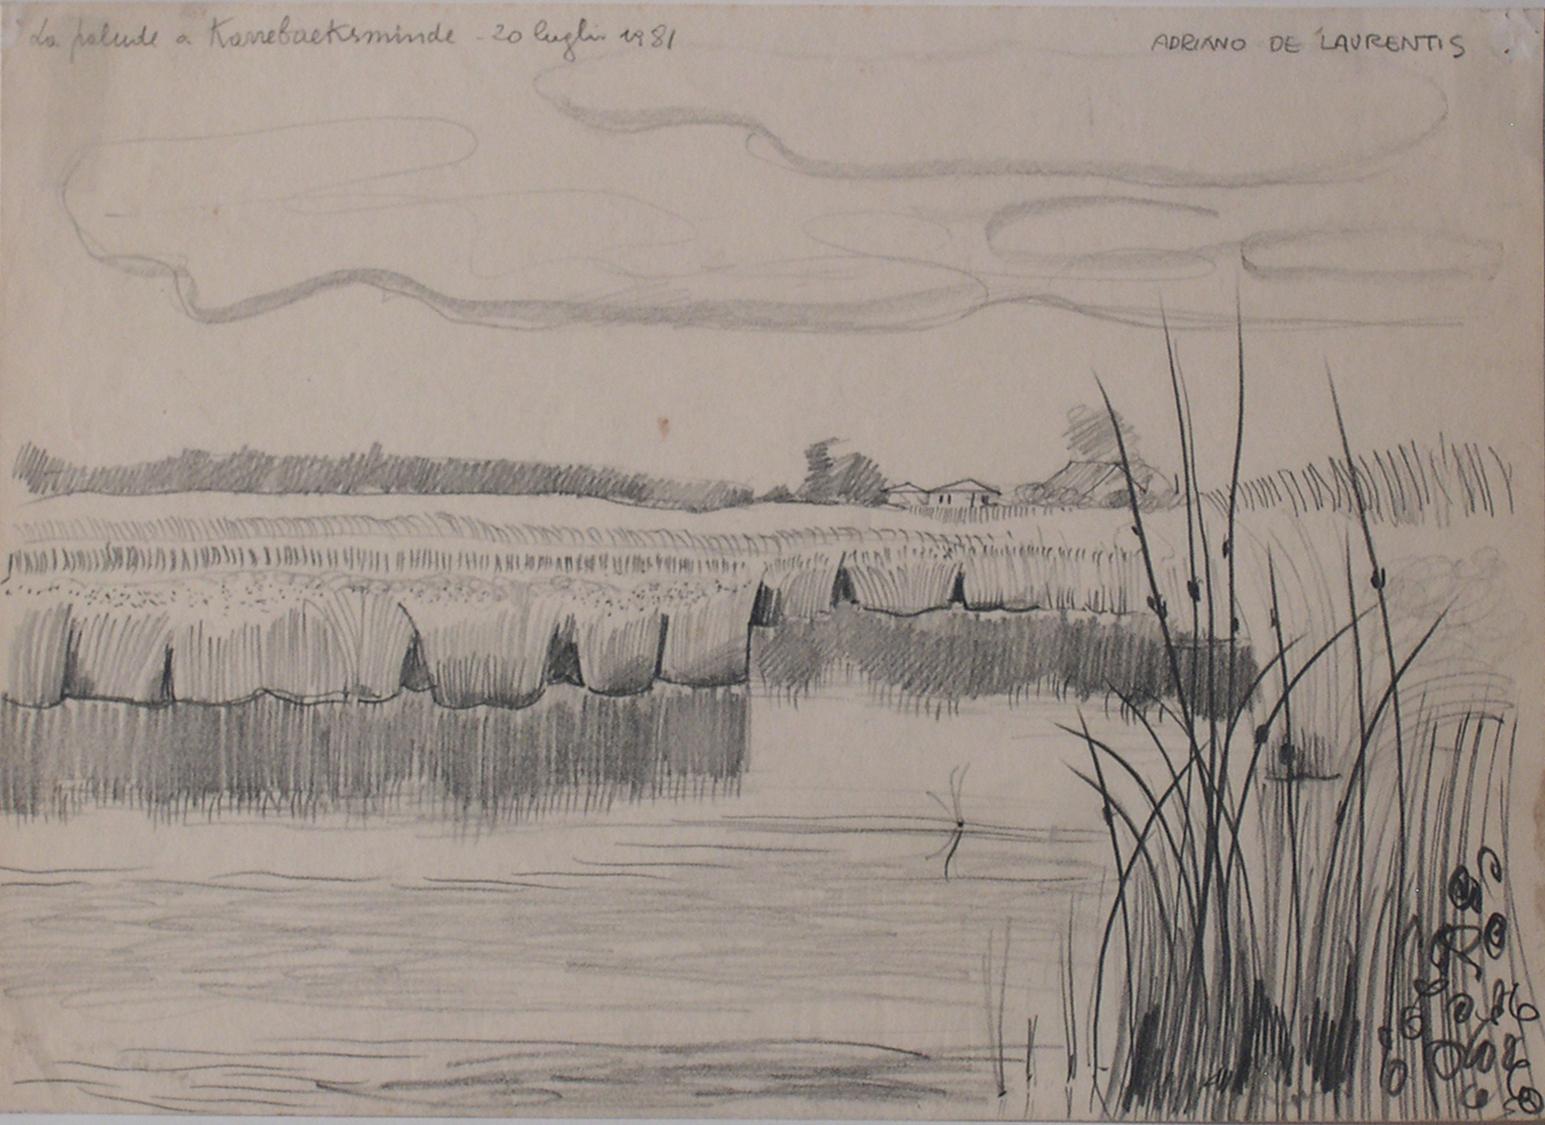 La palude a Karebeksminde - Matita su Carta - 25x34 - 1981